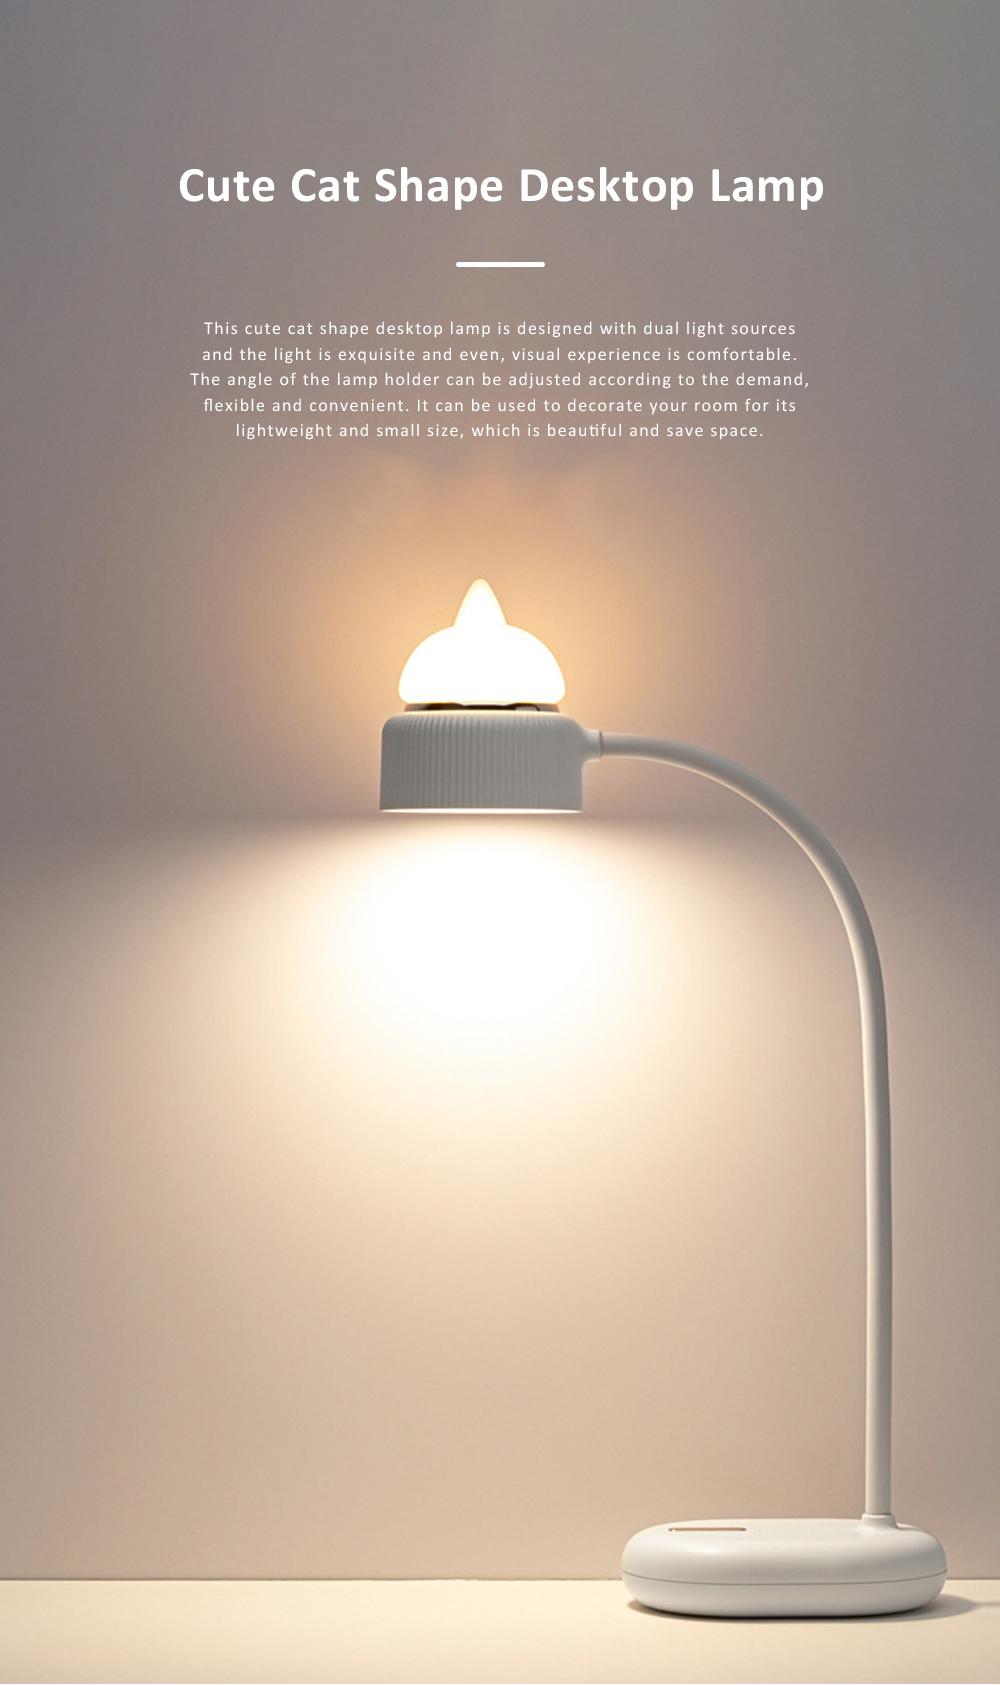 Cute Cat Shape Desktop Lamp USB Charging Bedside Reading Lamp Rechargeable Eye Protected Lamp 0